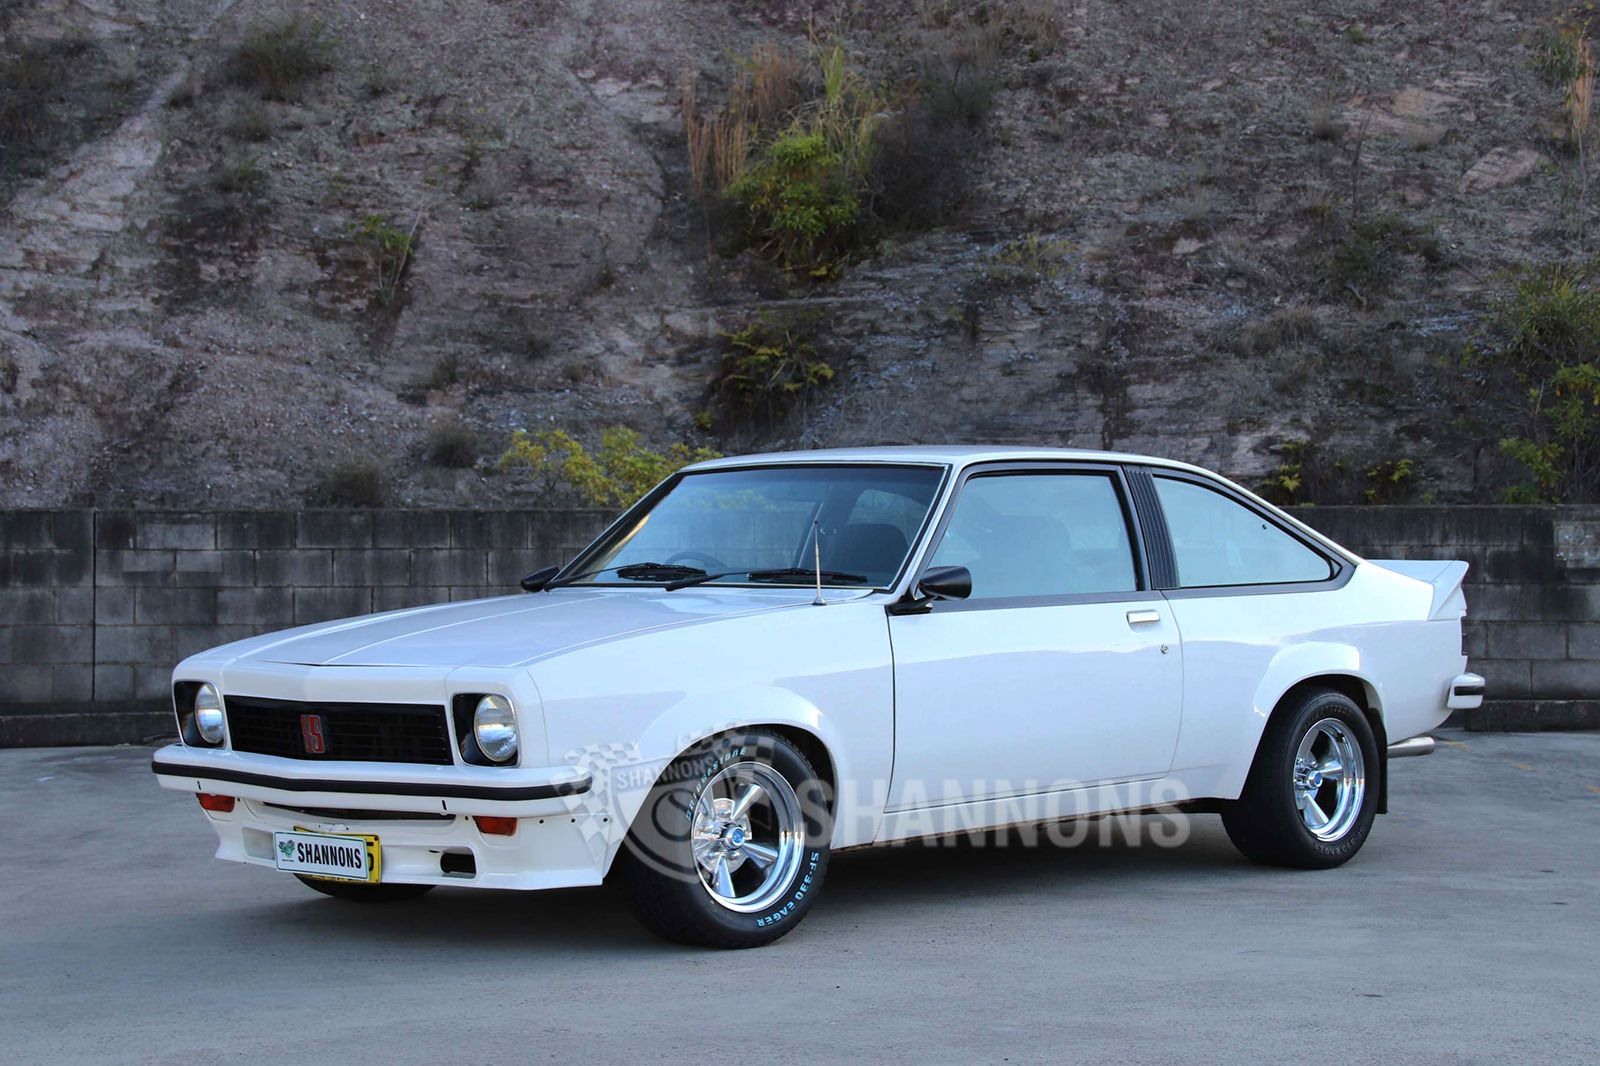 1976 Holden Monaro - LX Torana SS V8 'Improved'   Classic